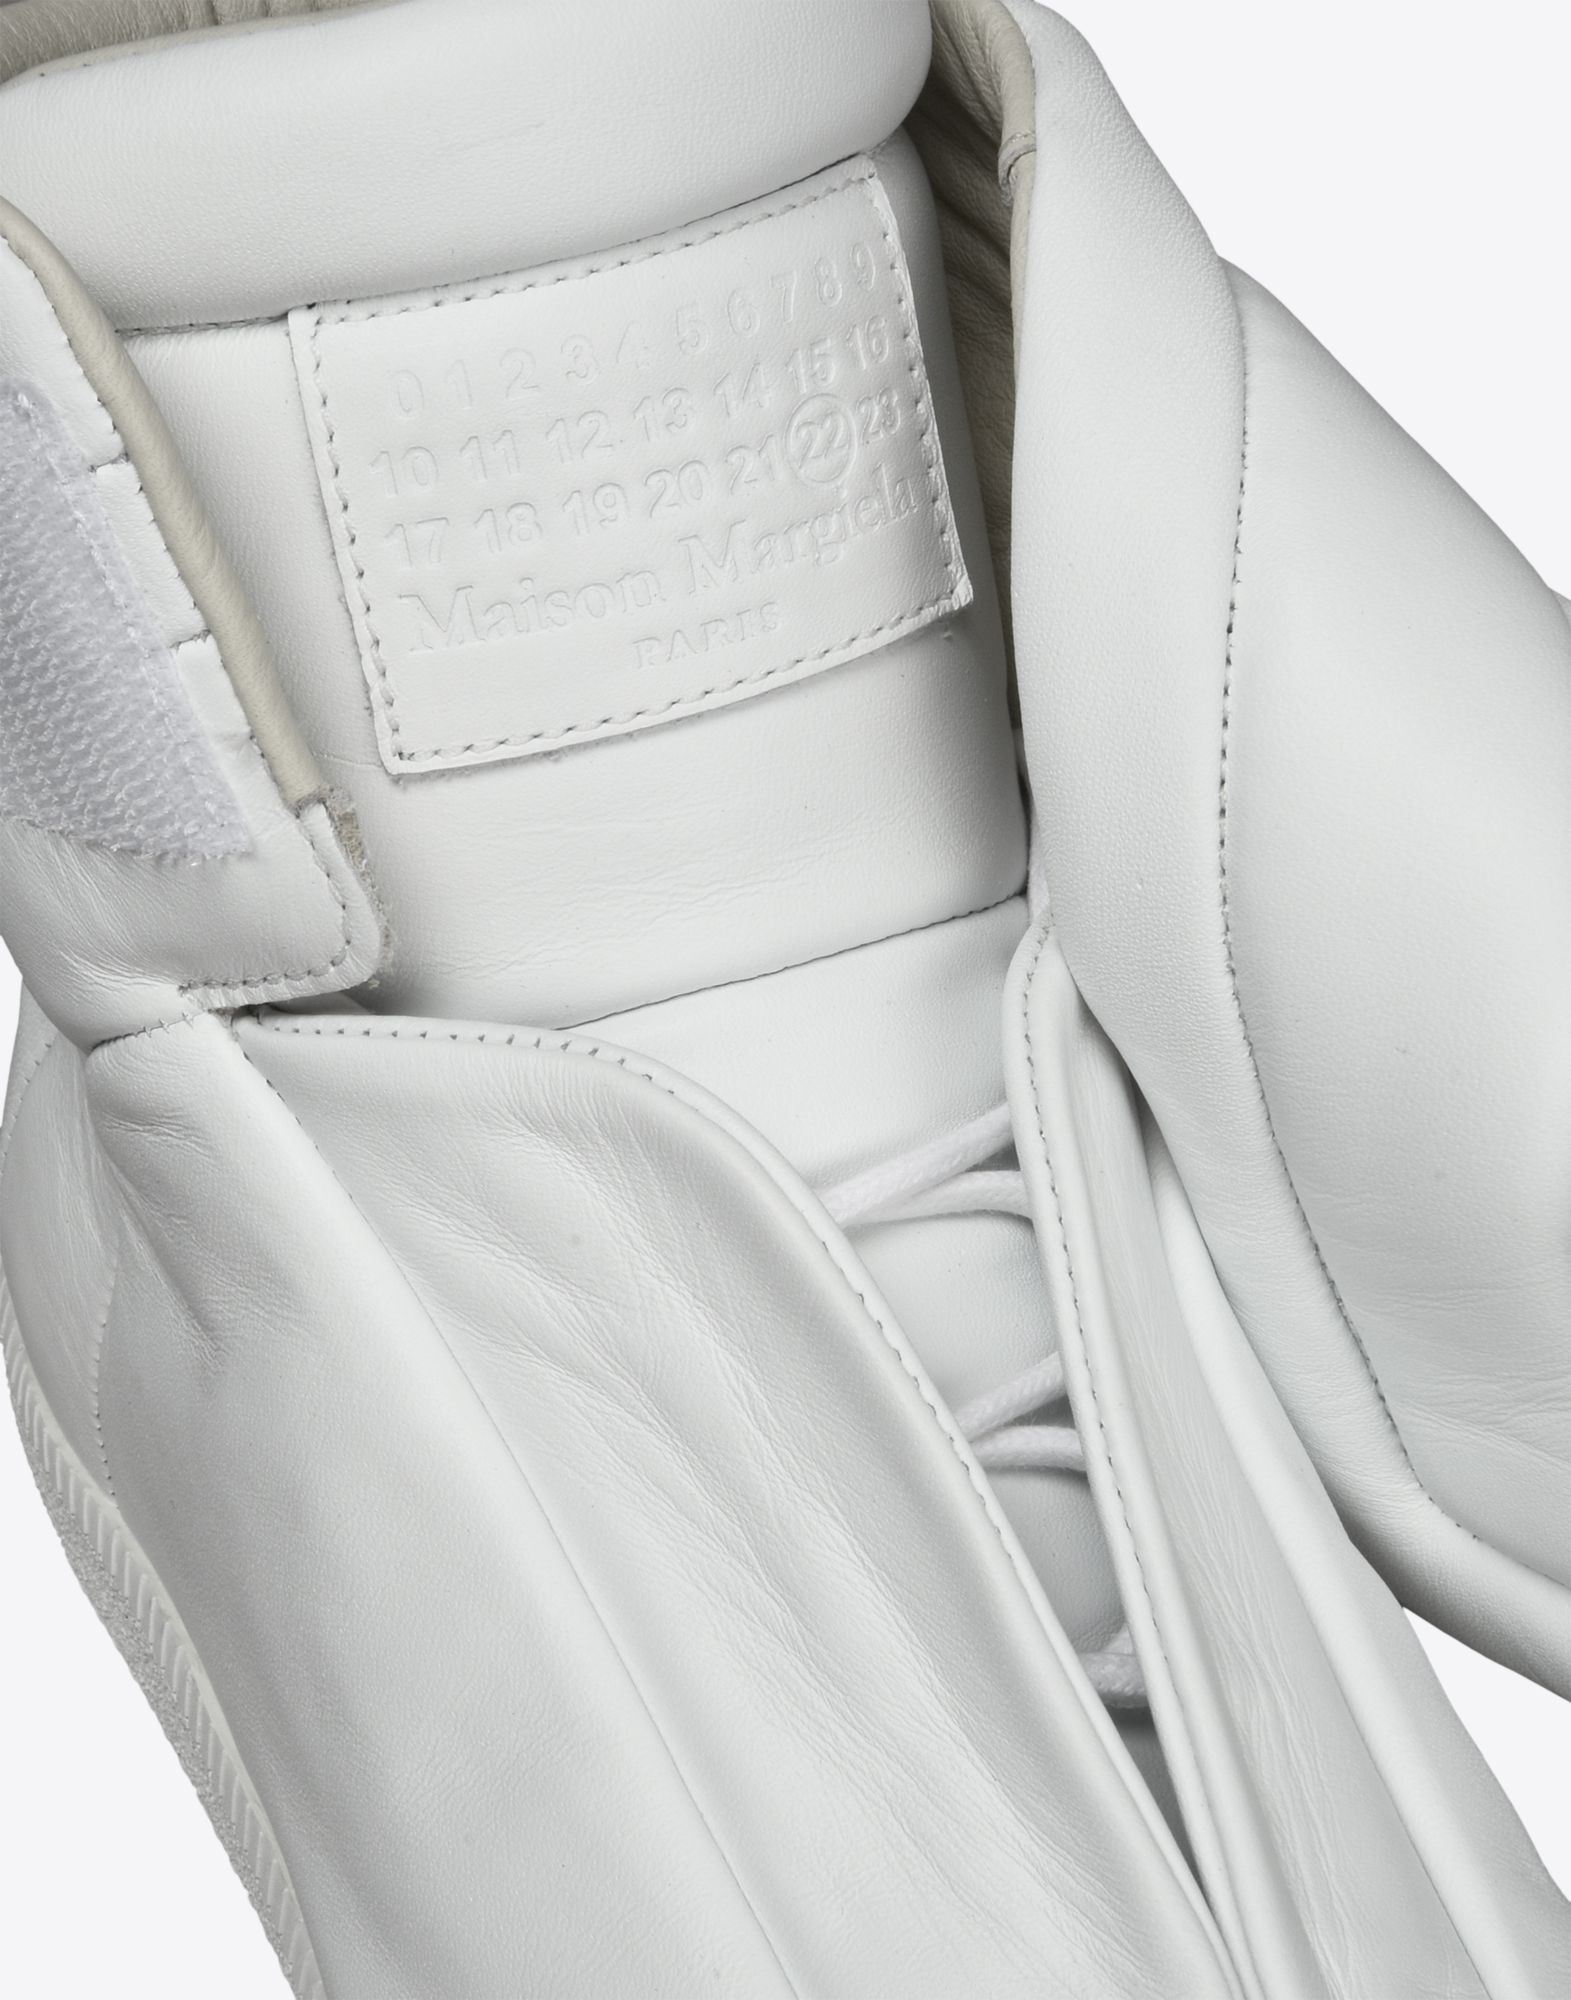 MAISON MARGIELA 22 Baskets 'Future' hautes Sneakers Homme e